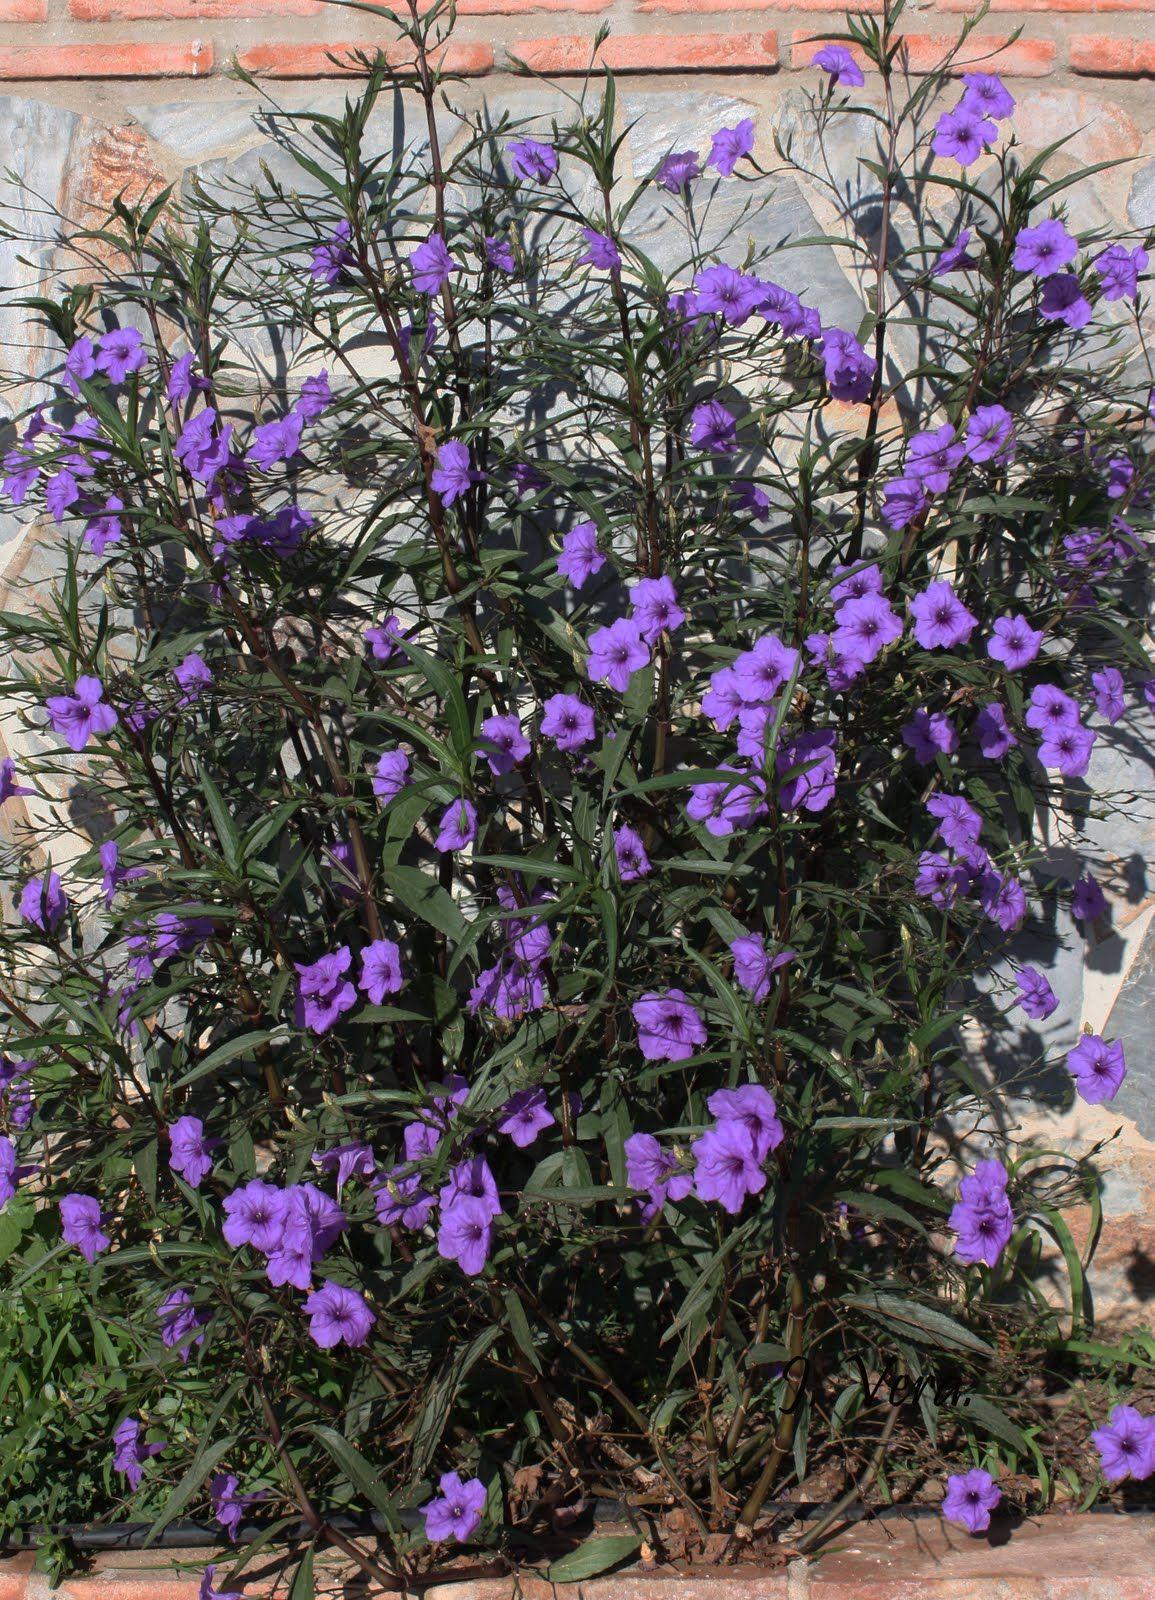 Pin By Connie Reid On Flowers Purple Plants Plants Planting Flowers